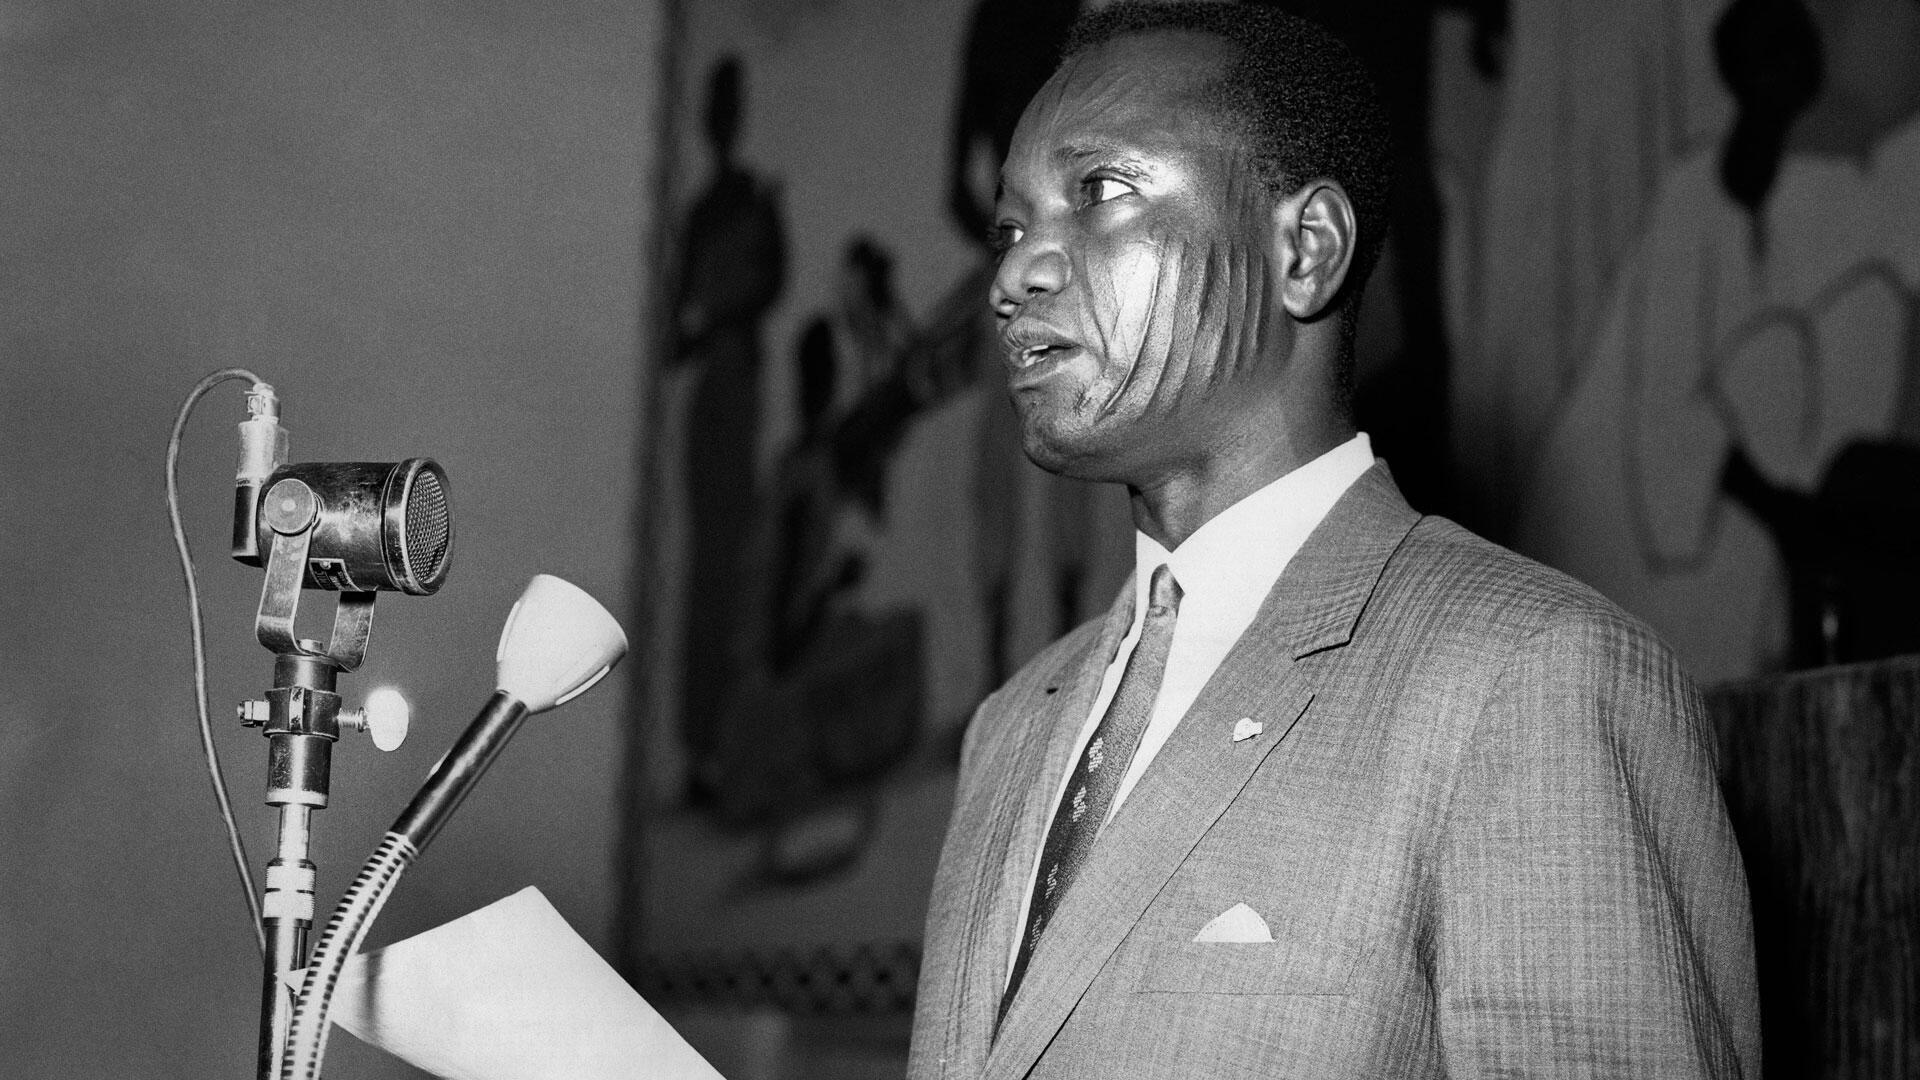 000_ARP2475772_Tchad-Tombalbaye-1960_1920px